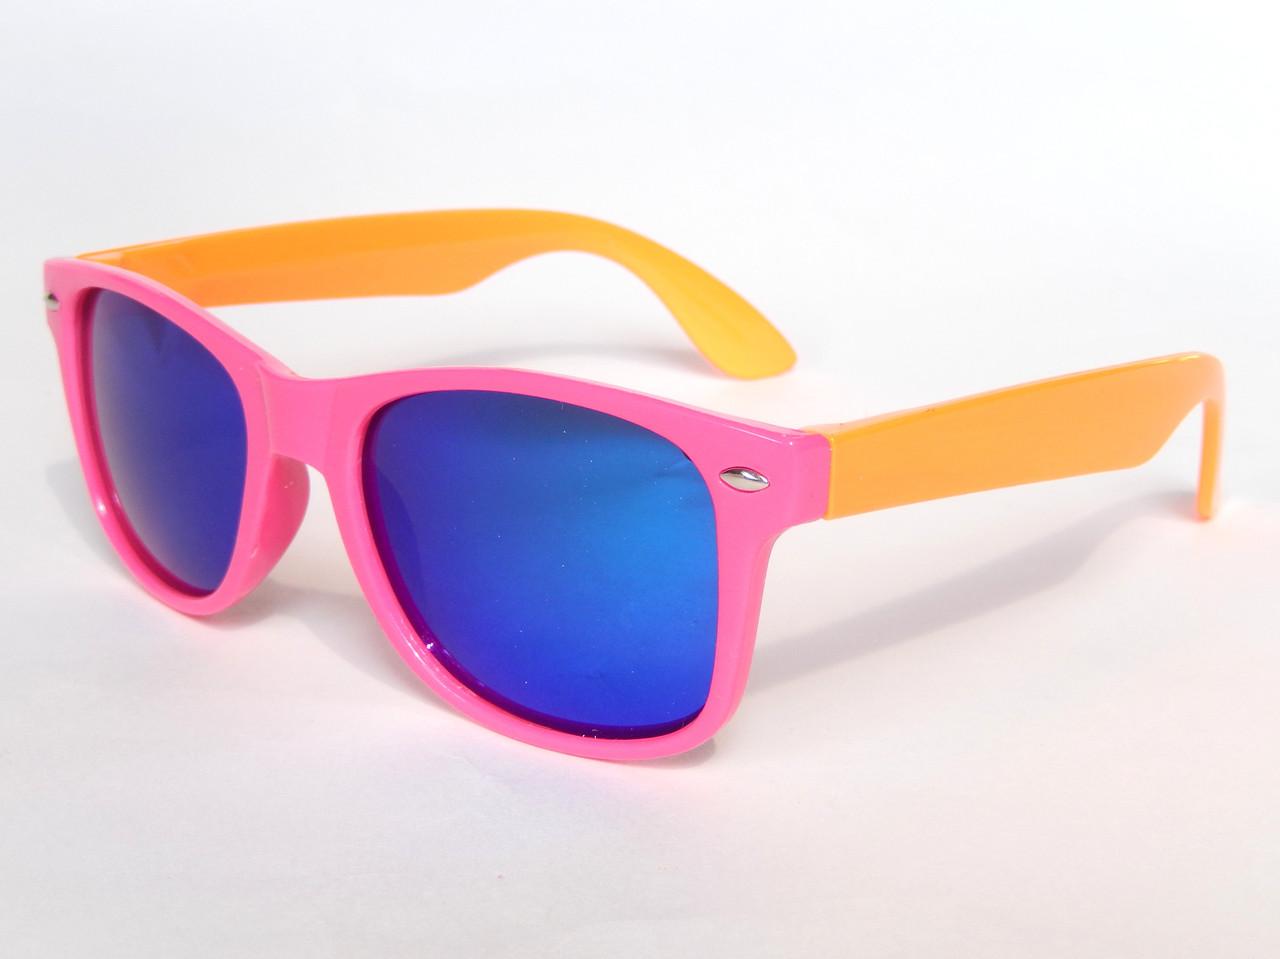 Очки детские в стиле Ray Ban pink/orange